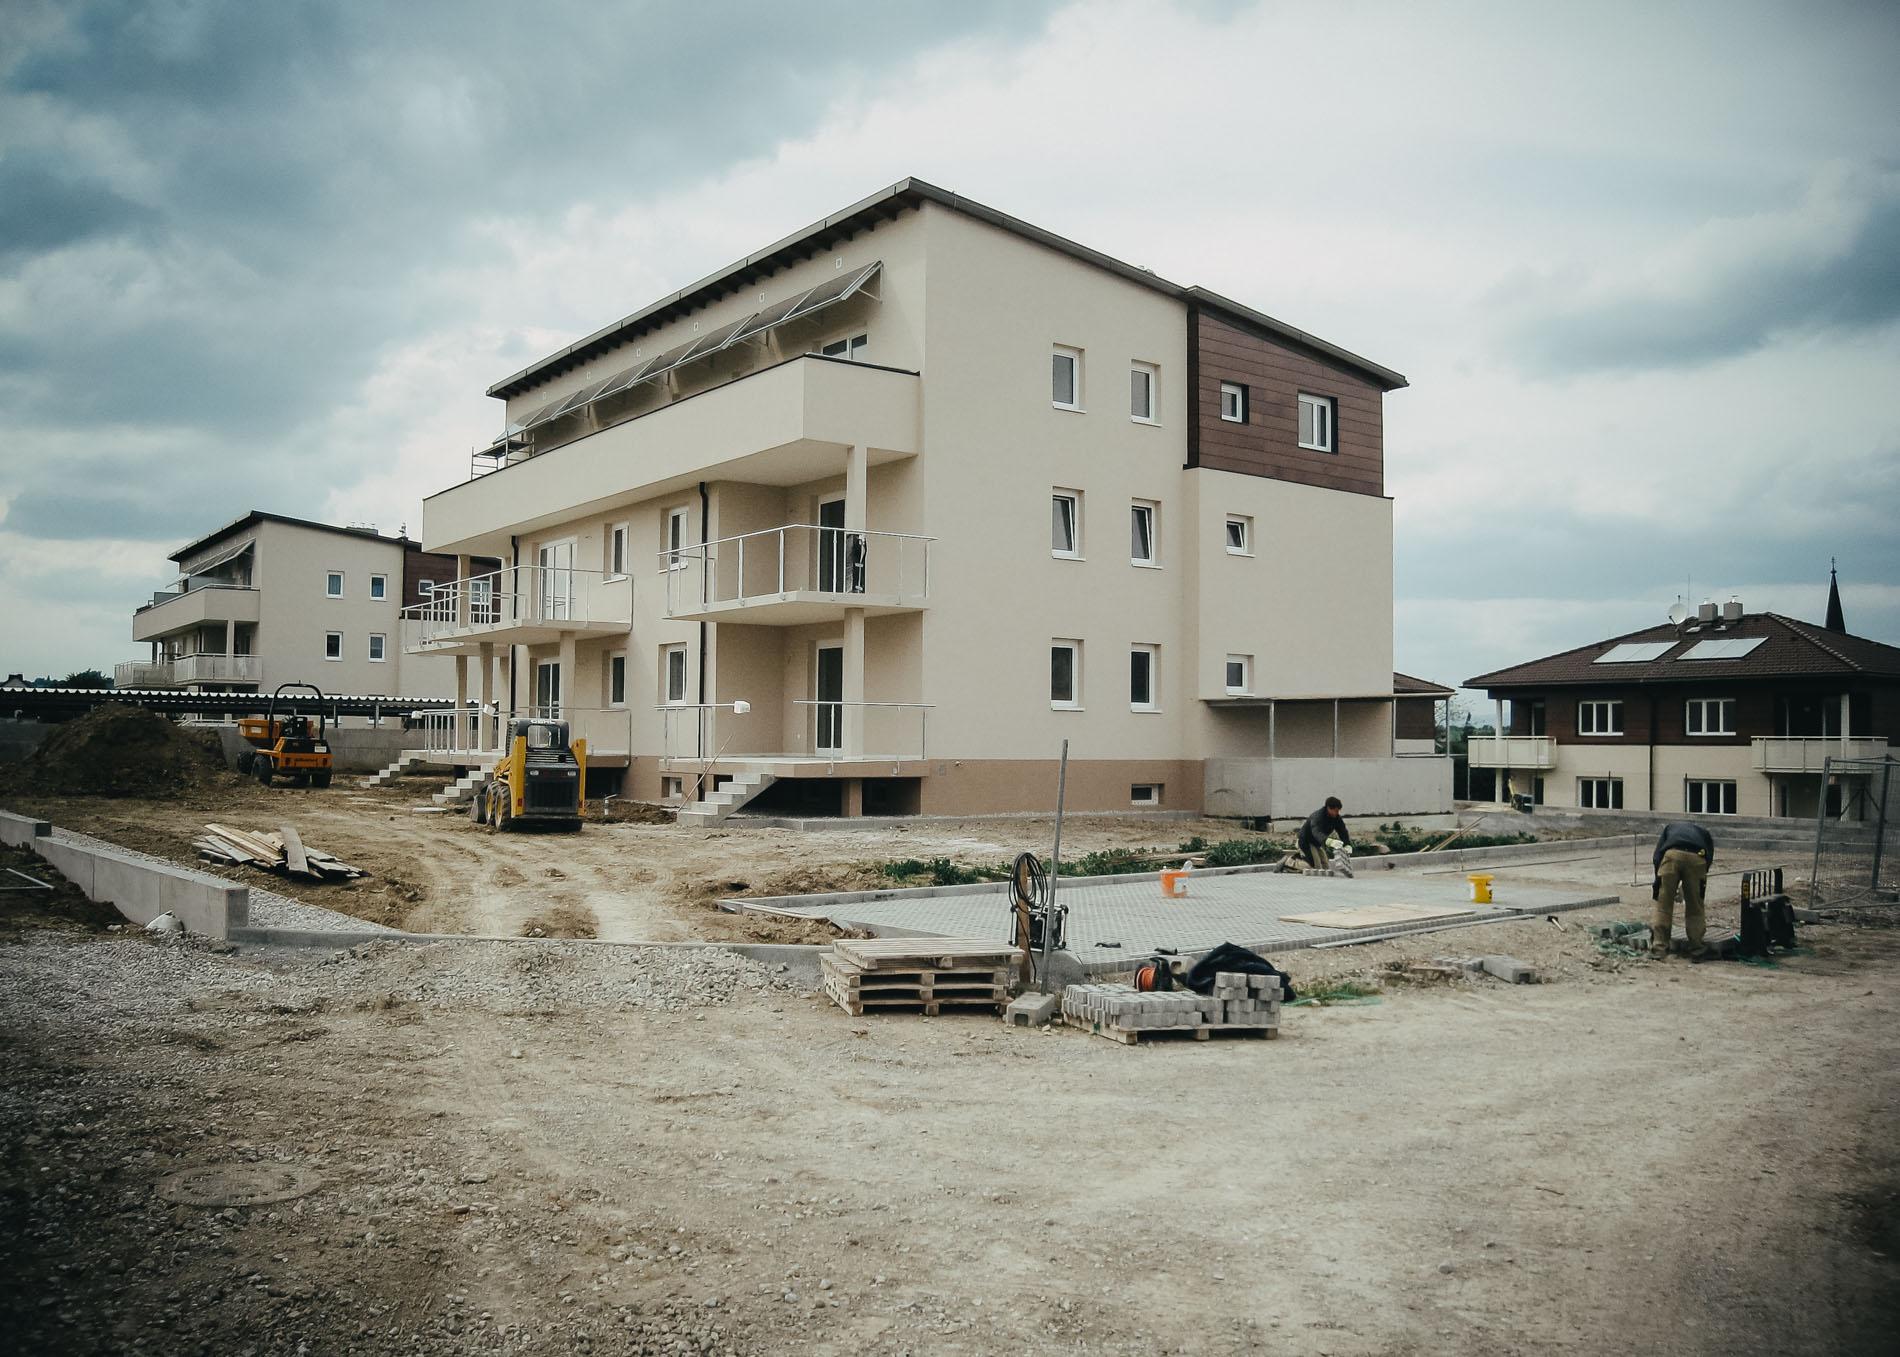 Hürm, Haus 2 WHA (1)